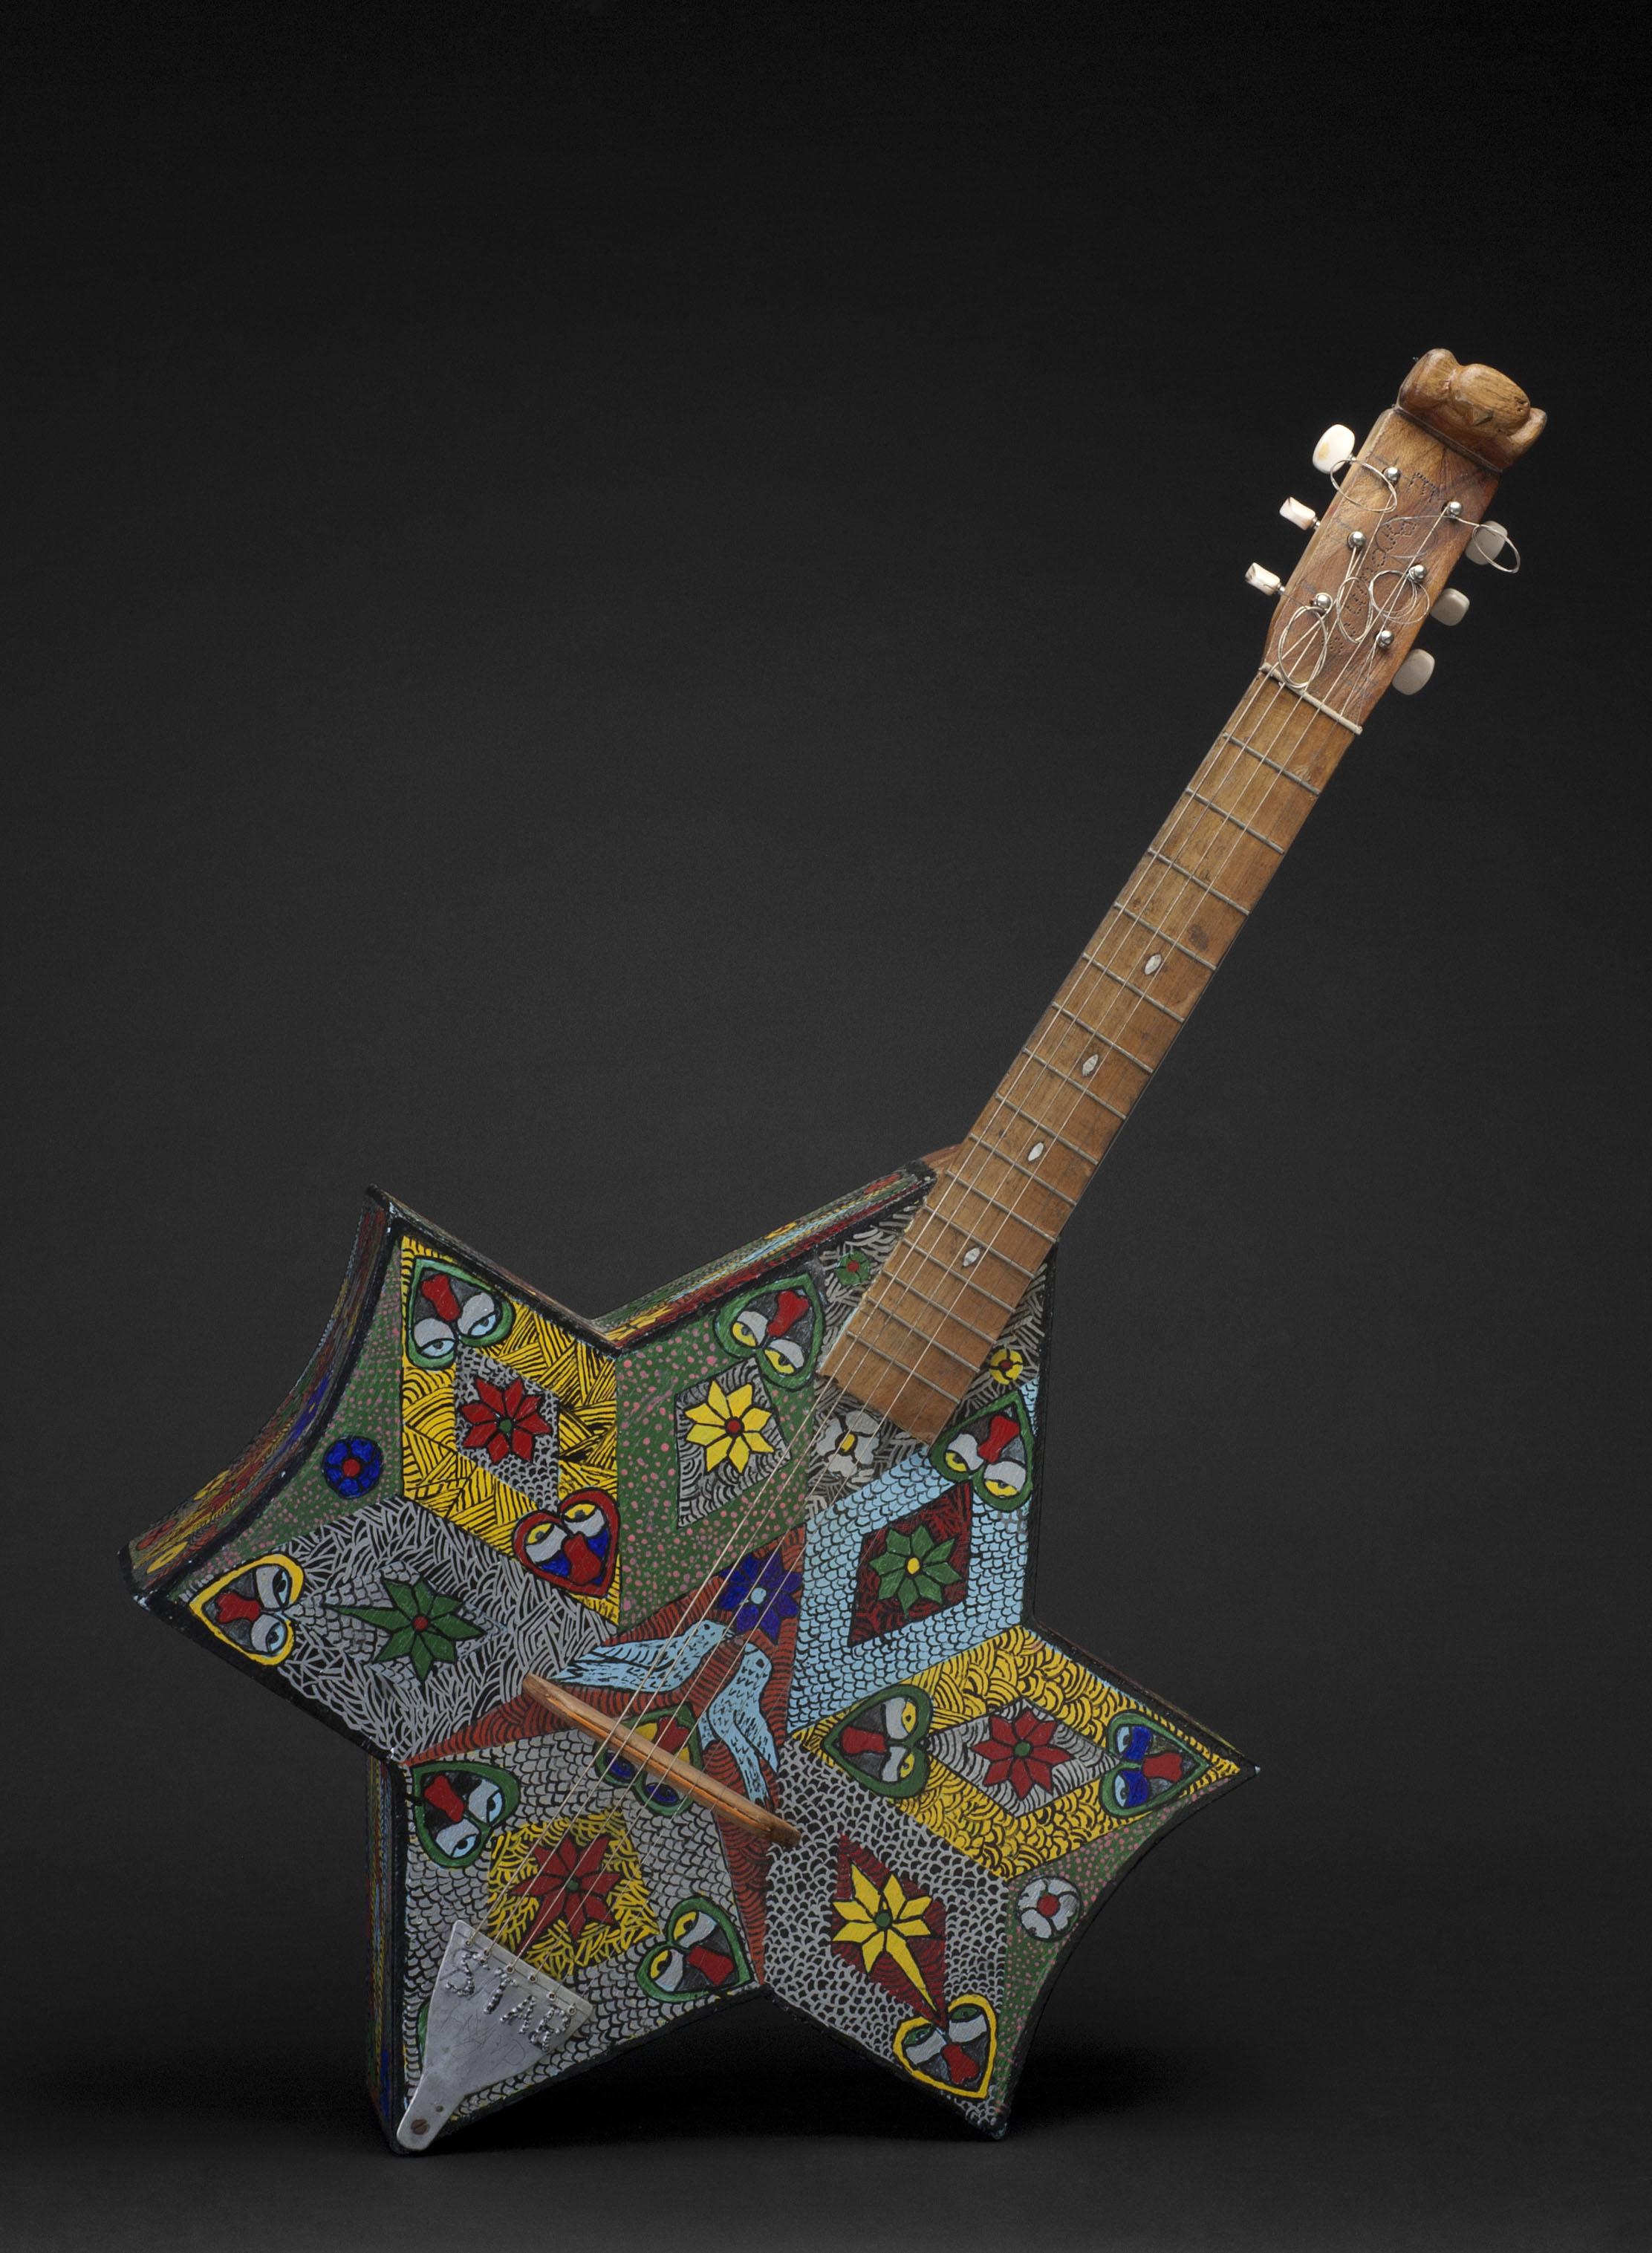 Everald Brown    Star Harp  , 1998 Metal, polychromed wood 35.5 x 17.75 x 5 inches / 90.2 x 45.1 x 12.7 cm / EB 31